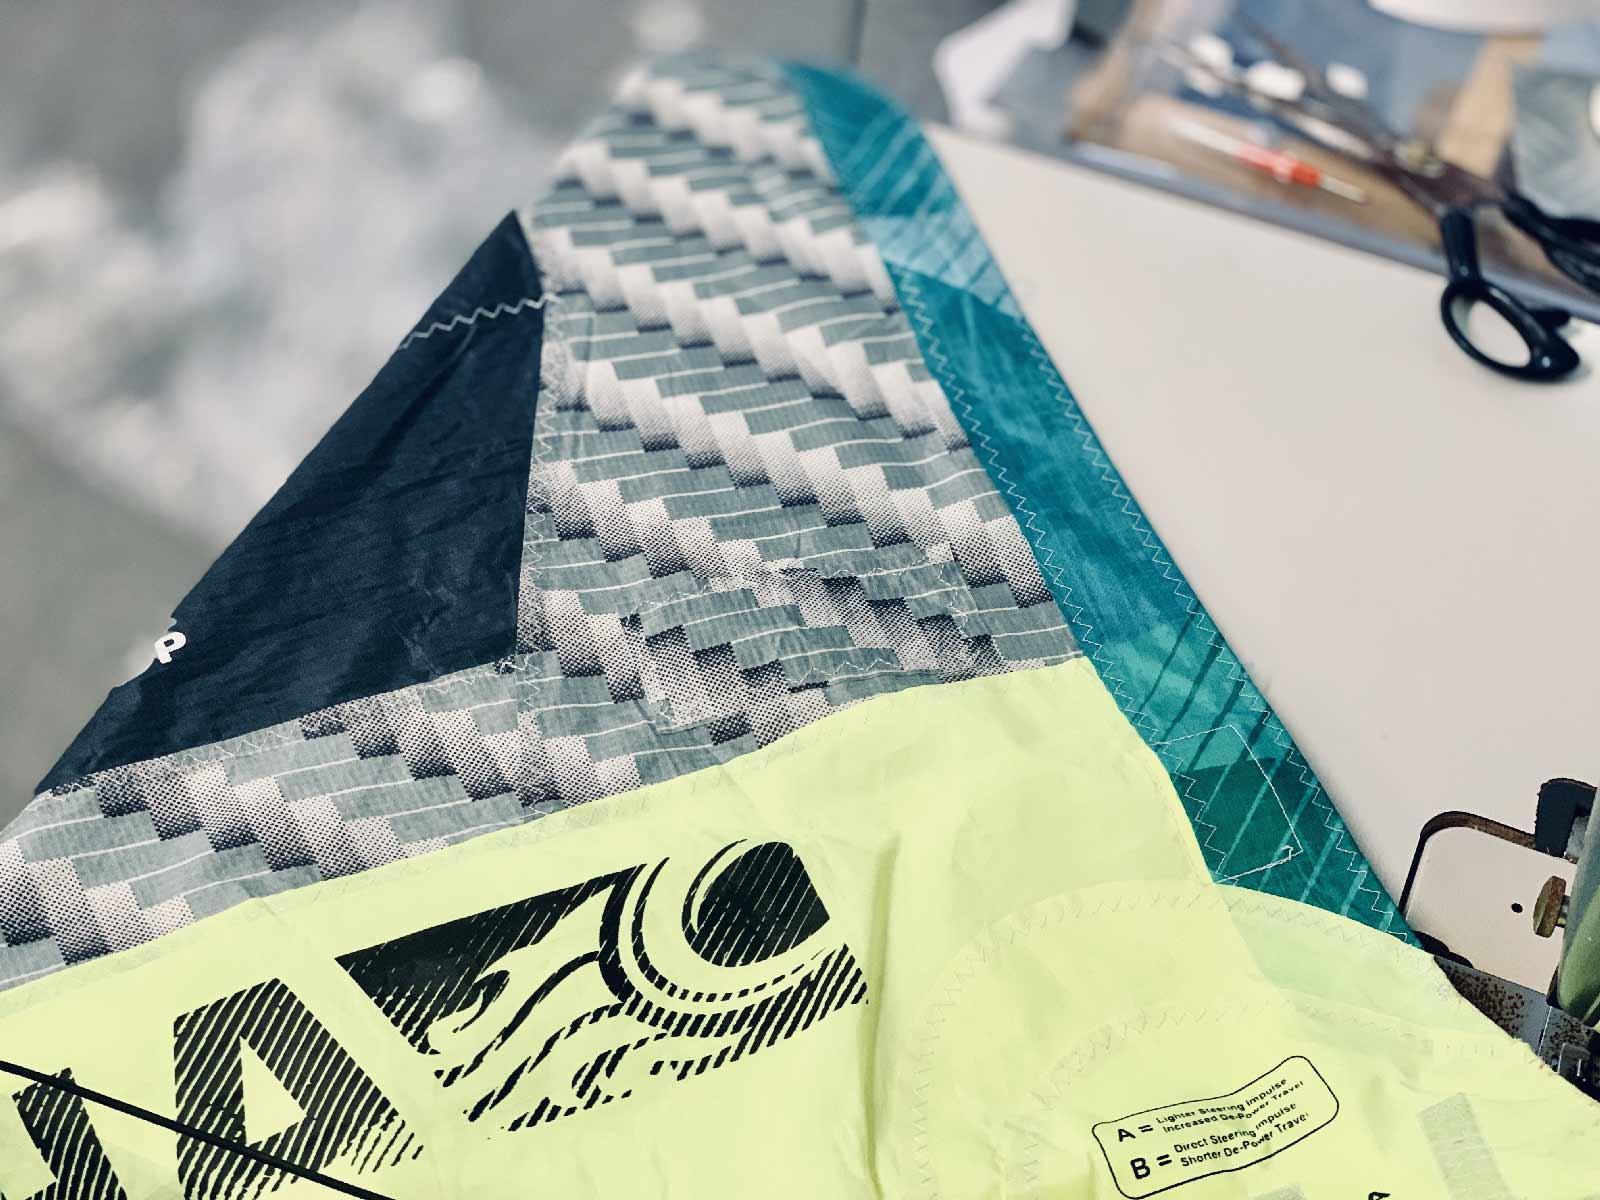 reparation-cabrinha-kitesurfix-1